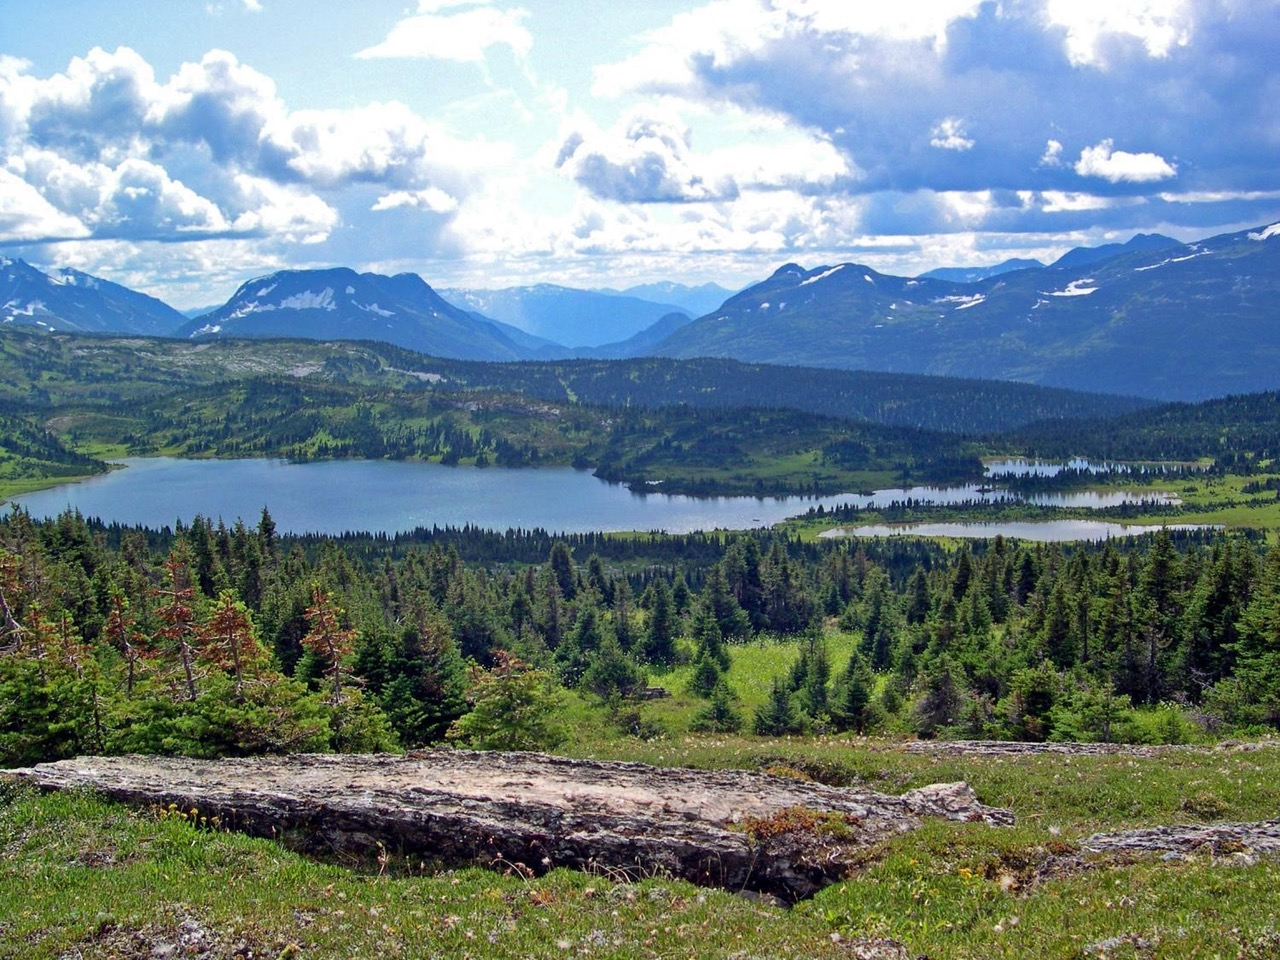 Wild Harts landscape in northern BC.